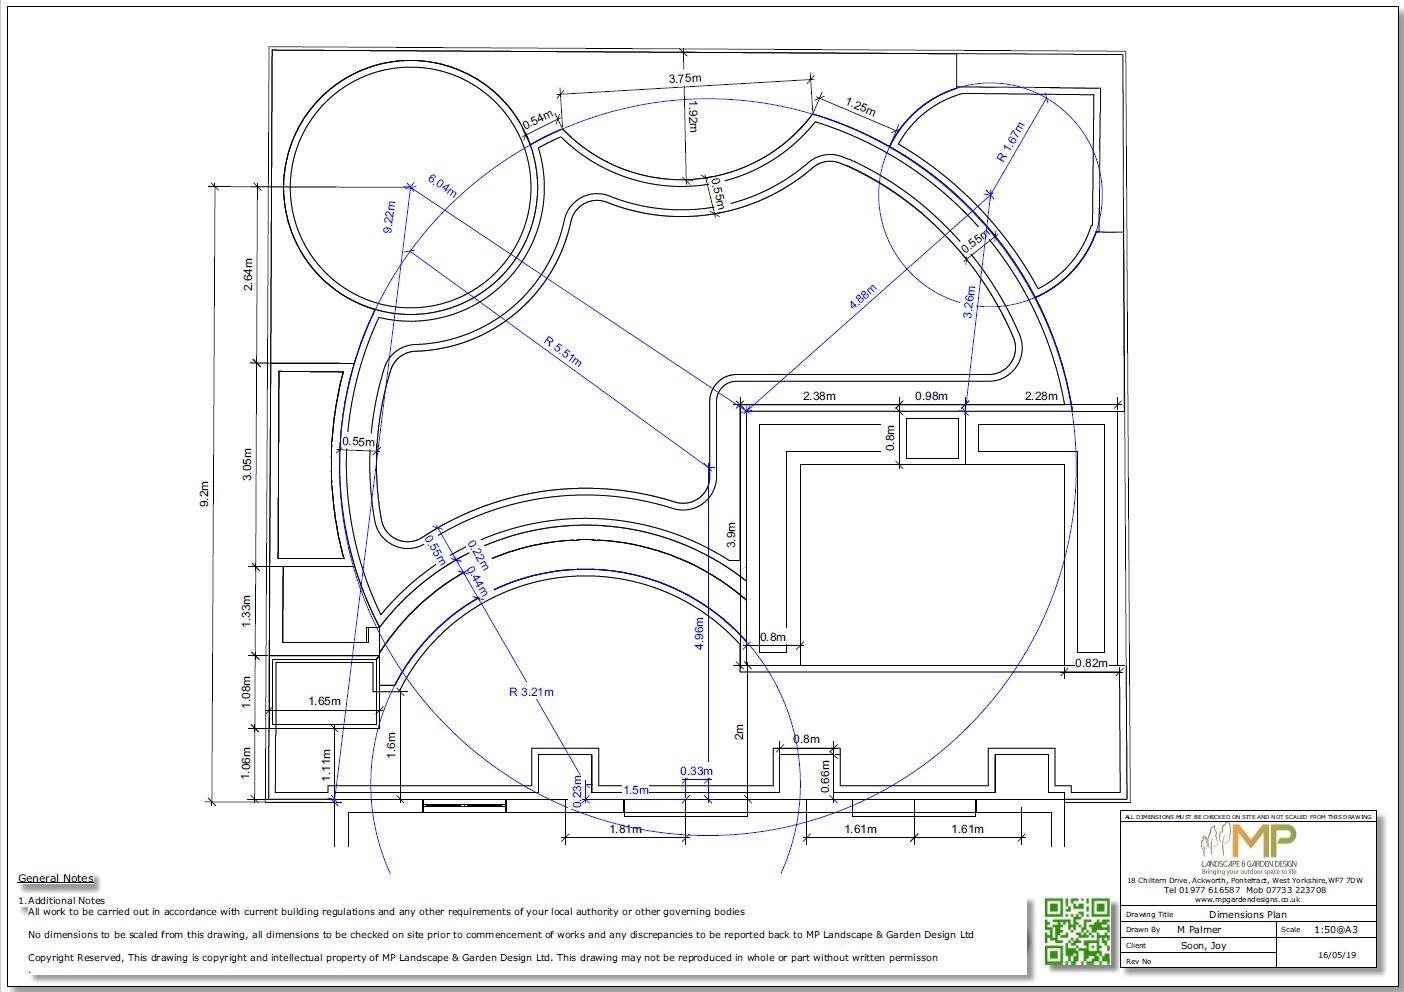 4. Garden design dimensions plan for a rear garden in Wakefield.